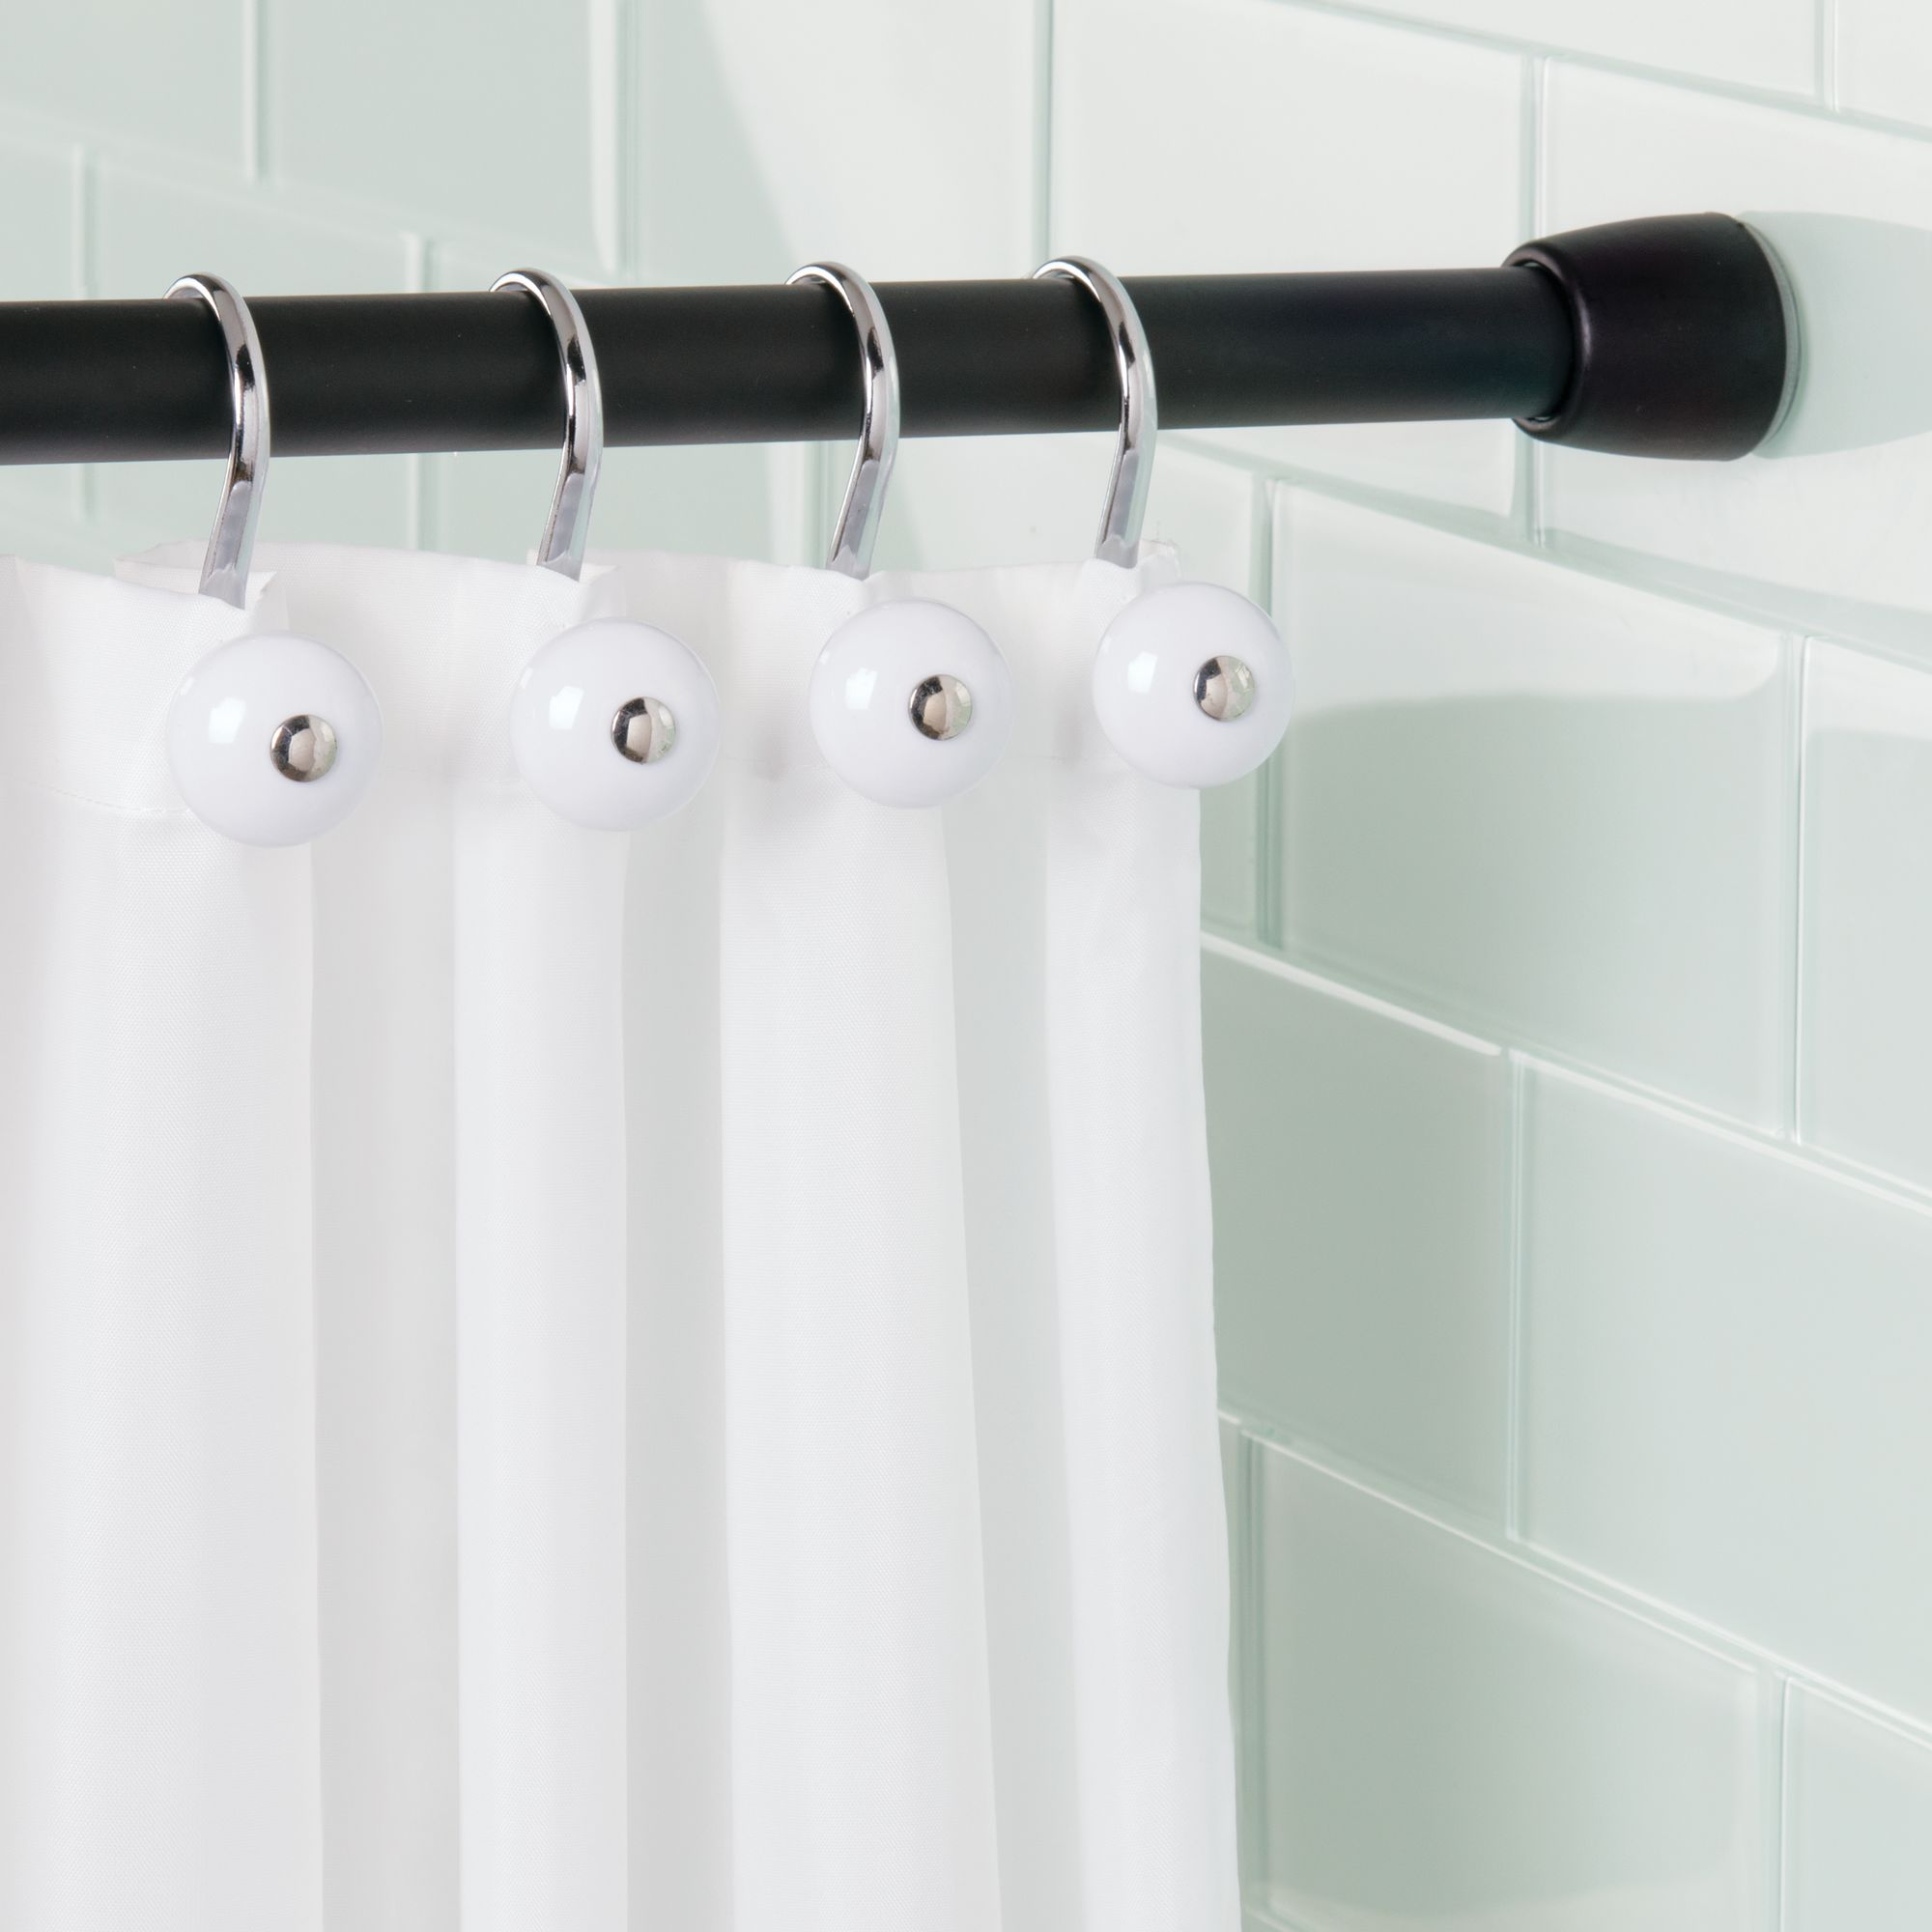 interdesign shower curtain tension rod matte black small 26 42